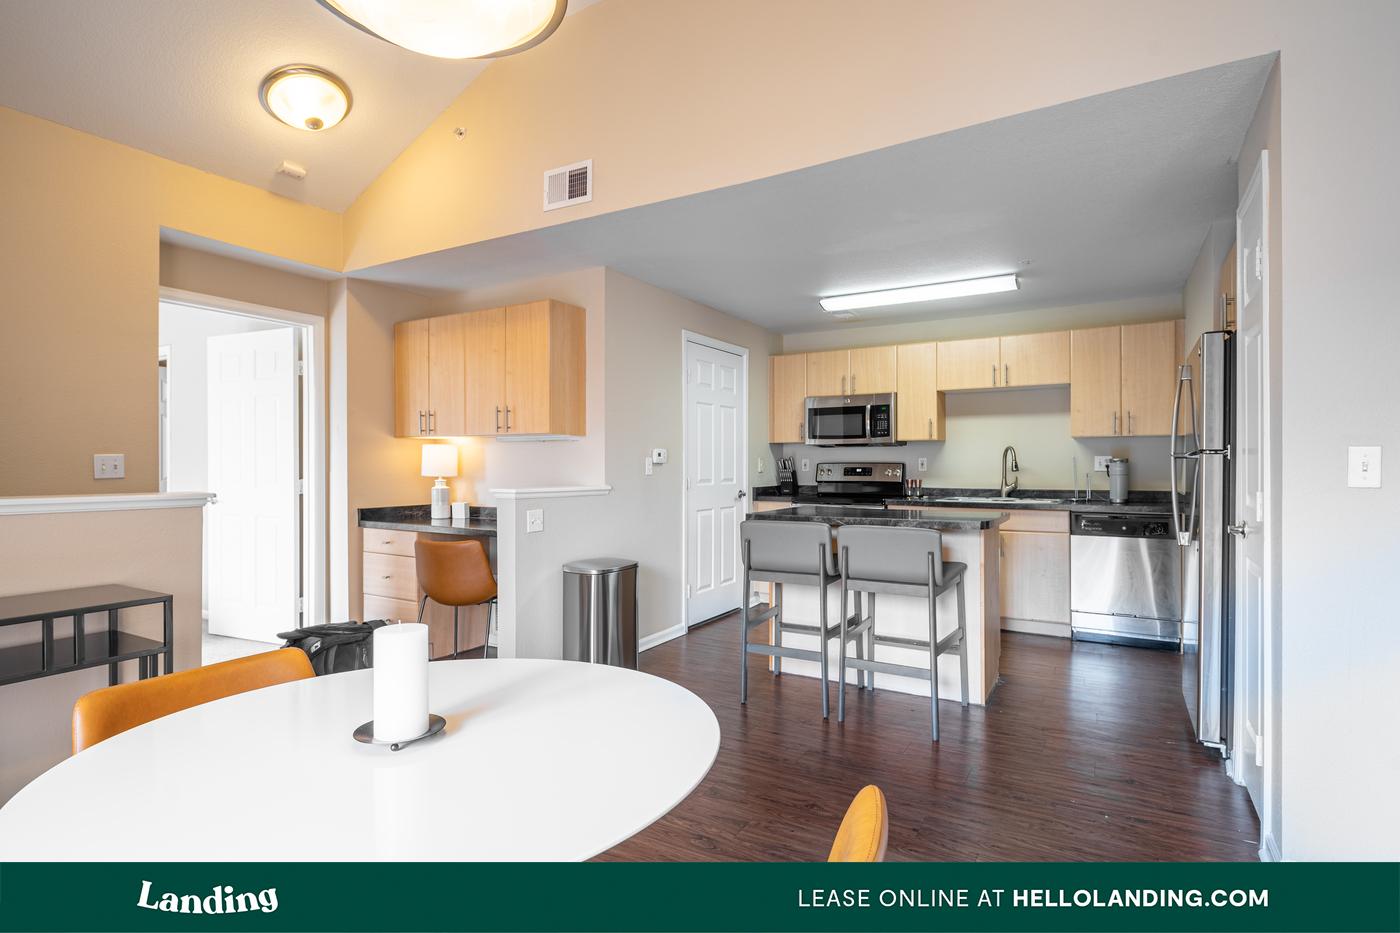 Landing Furnished Apartment Crestone for rent